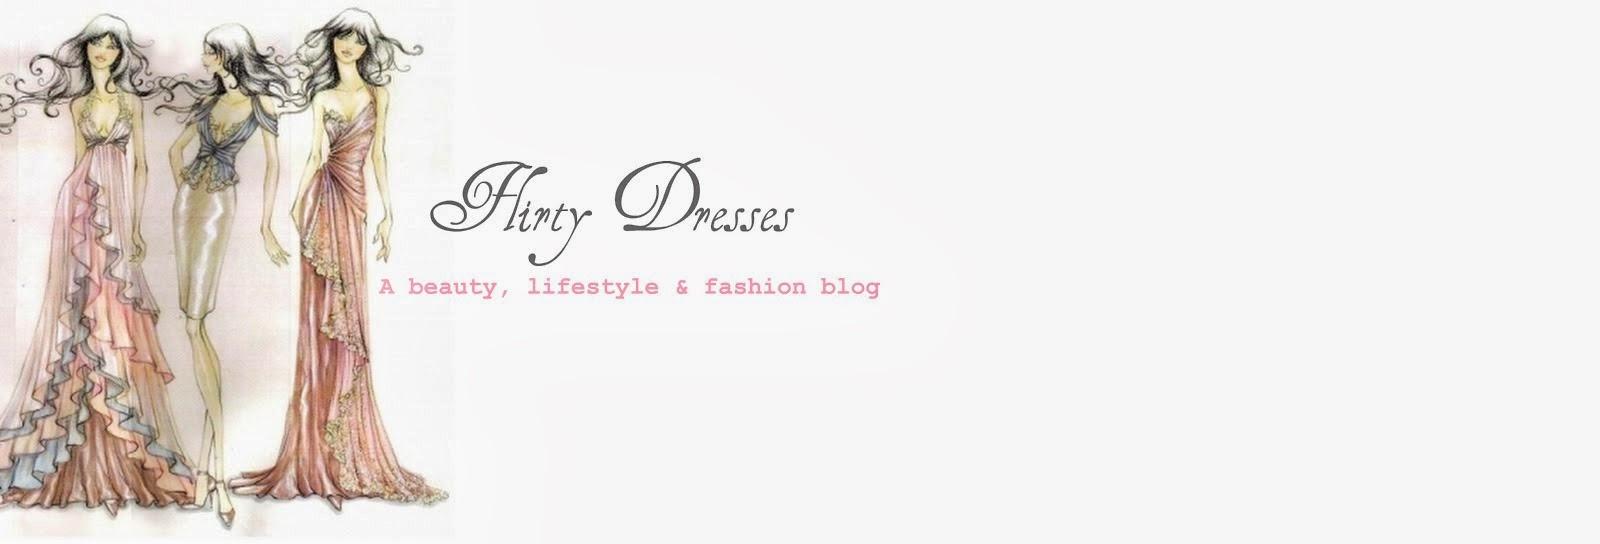 Flirty Dresses.